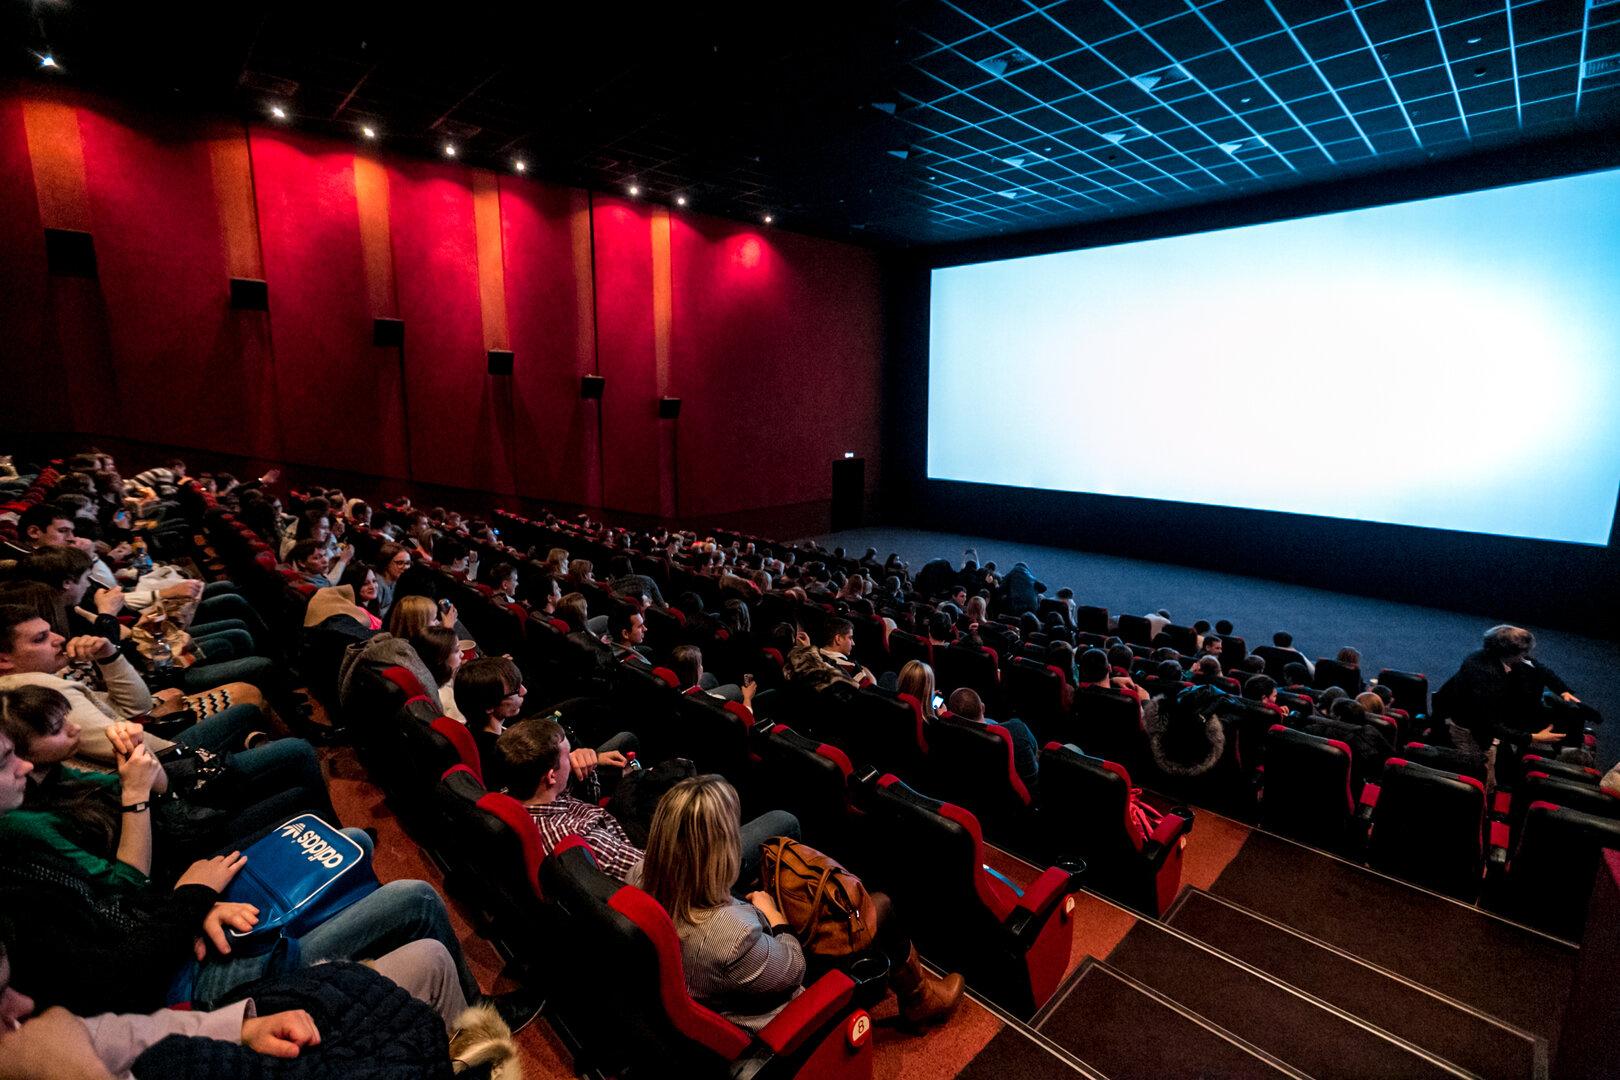 Трц фантастика нижний новгород афиша кино музей алабина стоимость билета